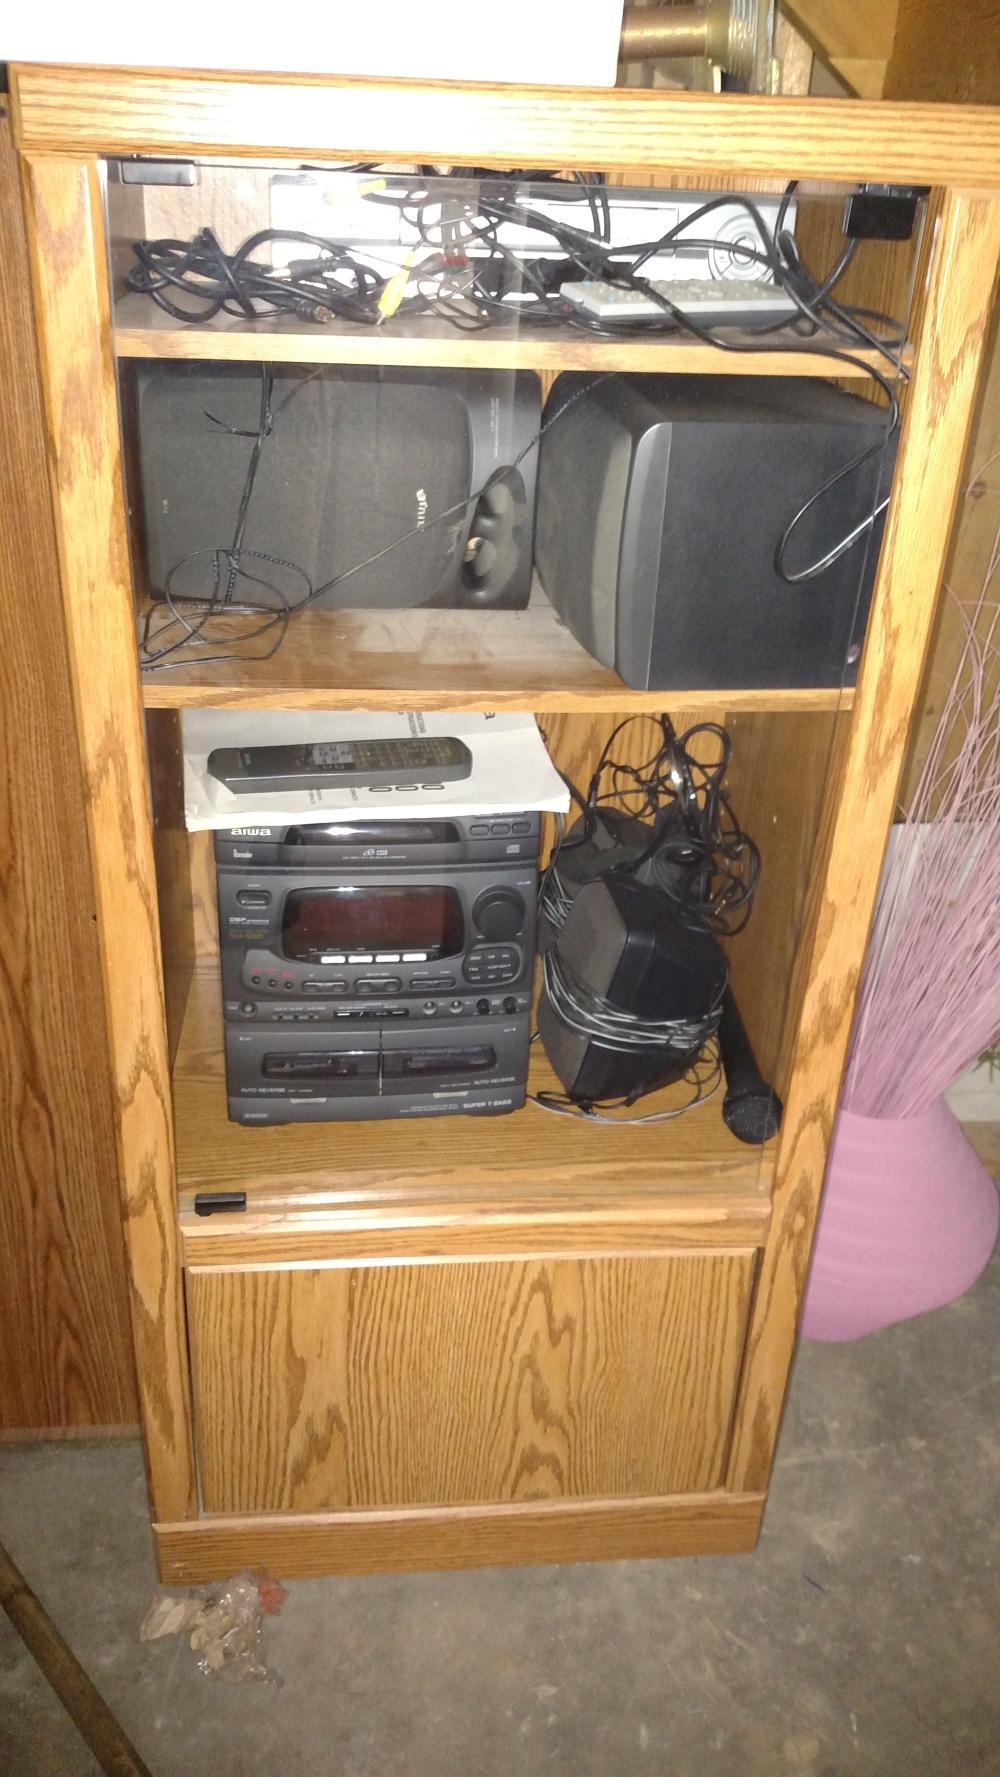 Aiwa stereo, 3 CD AM/FM cassette w/ speakers in cabinet